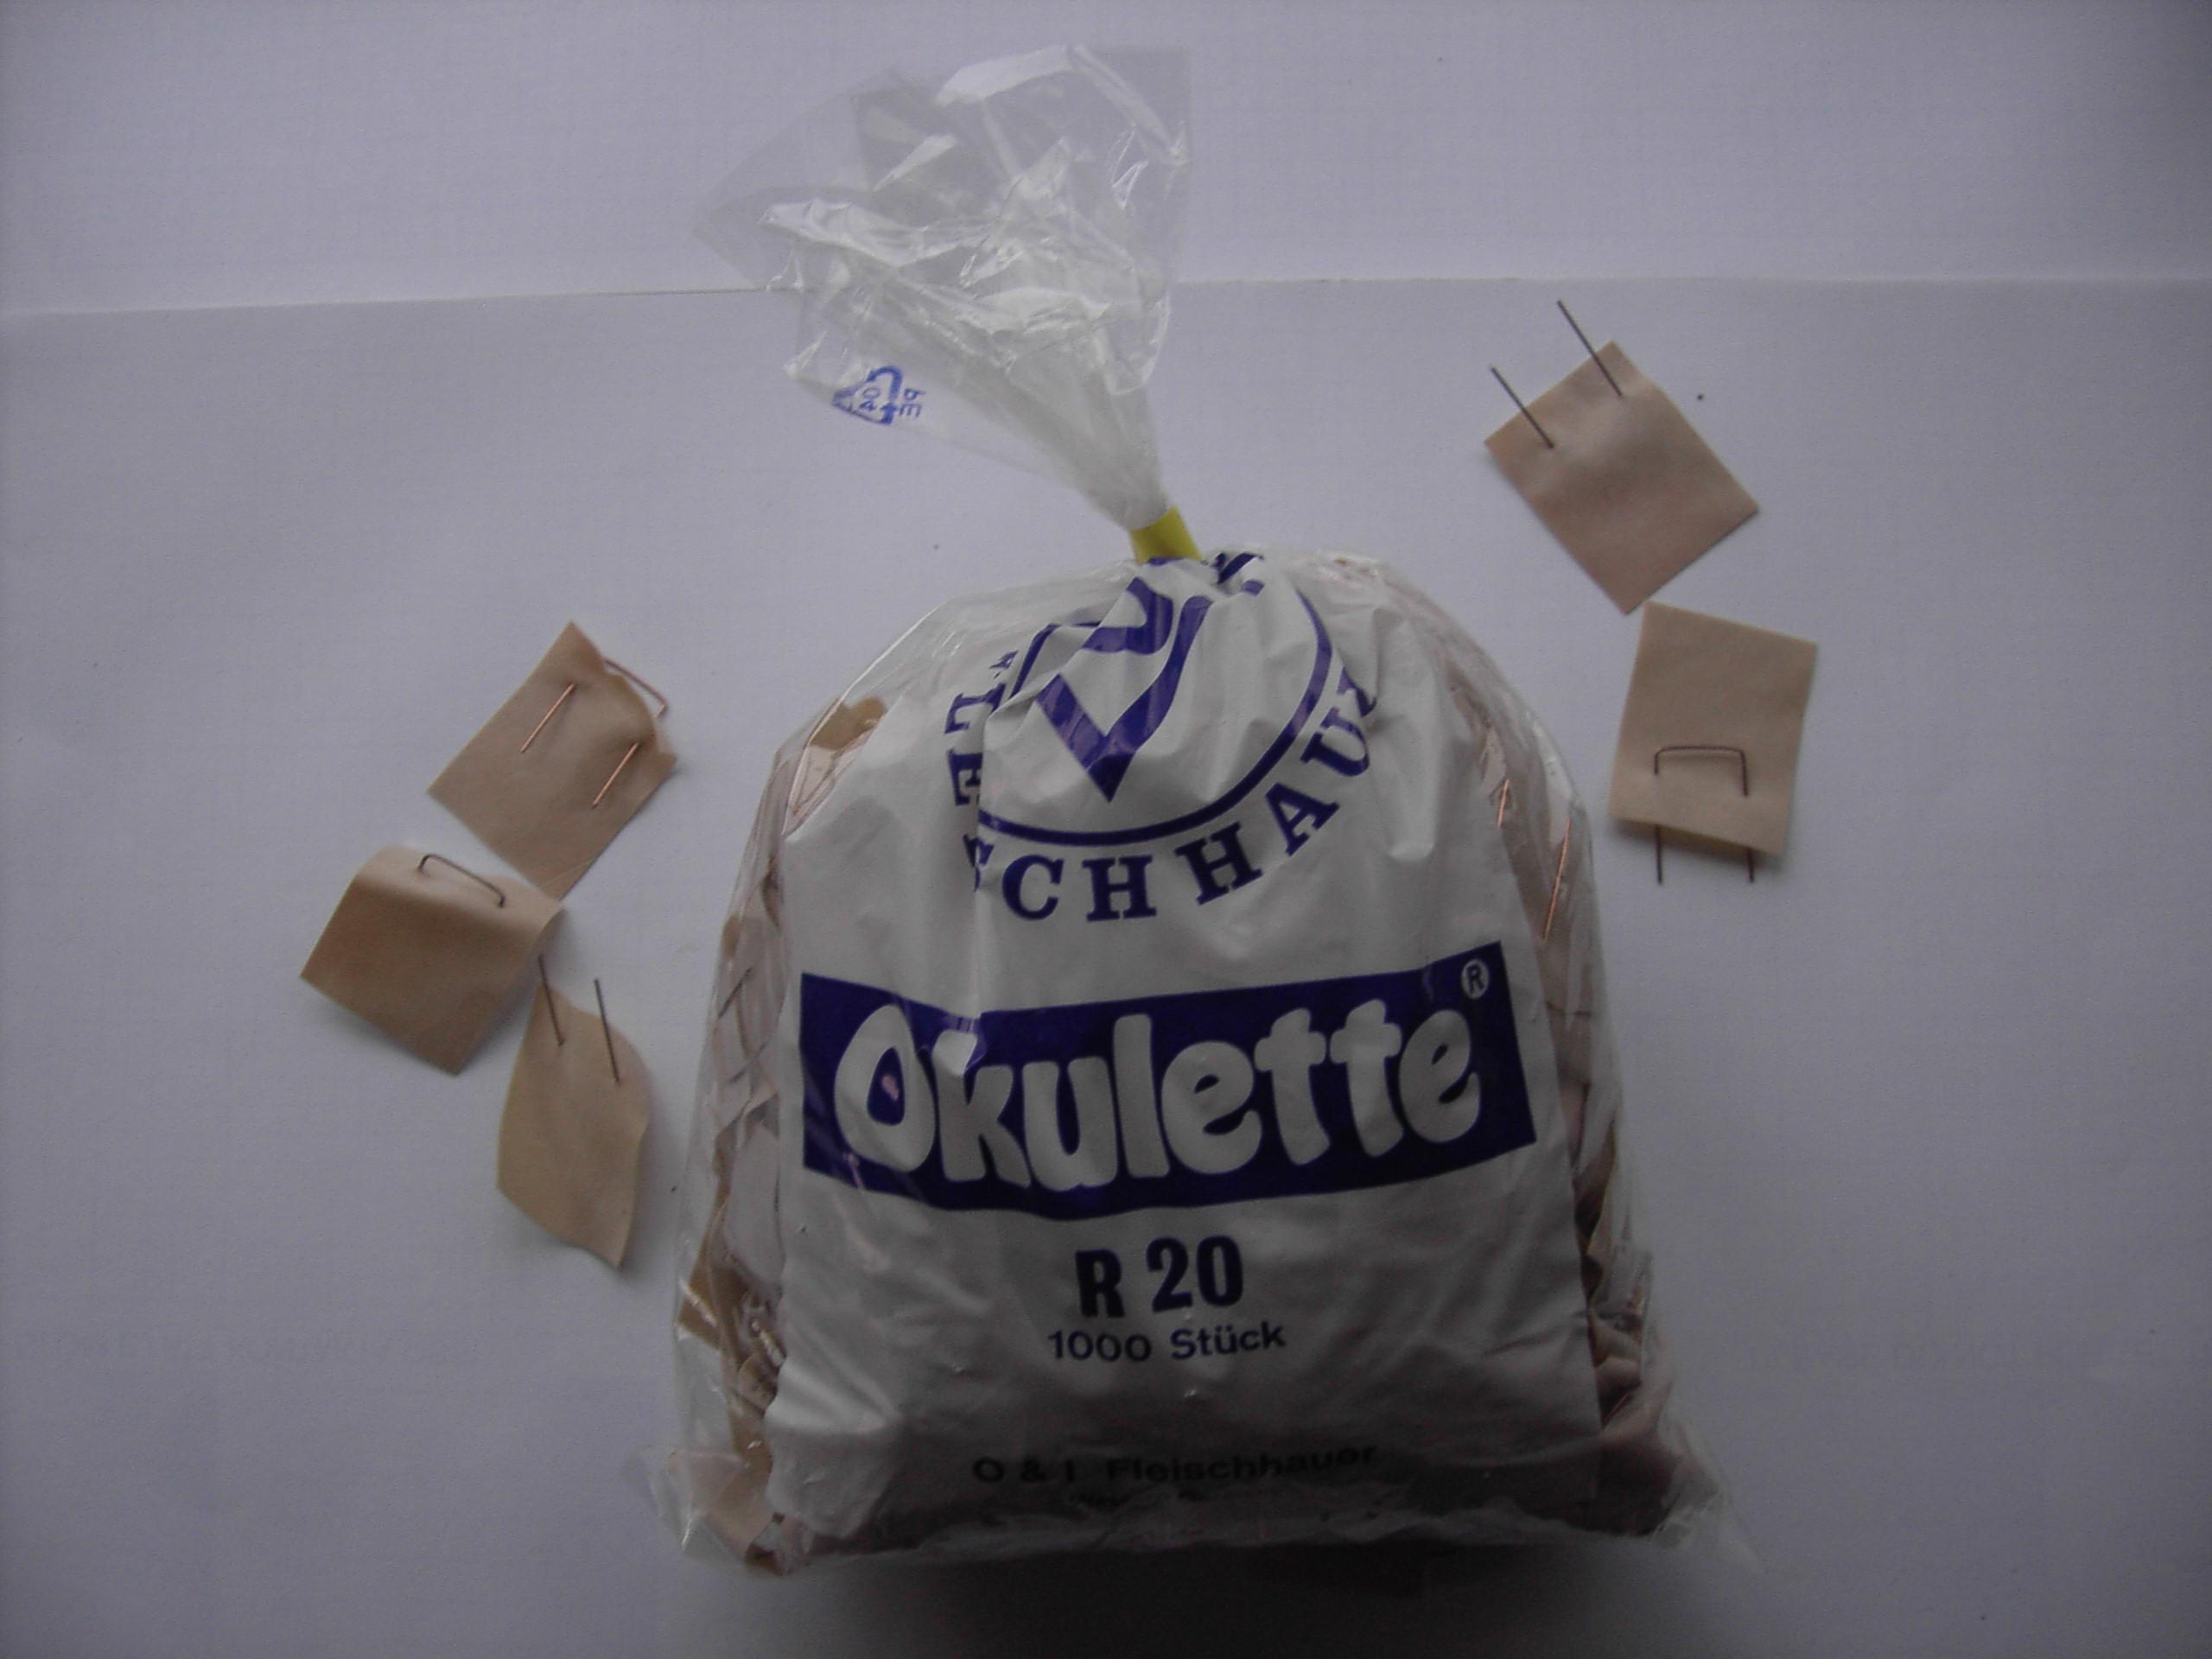 Okulette & Flexiband